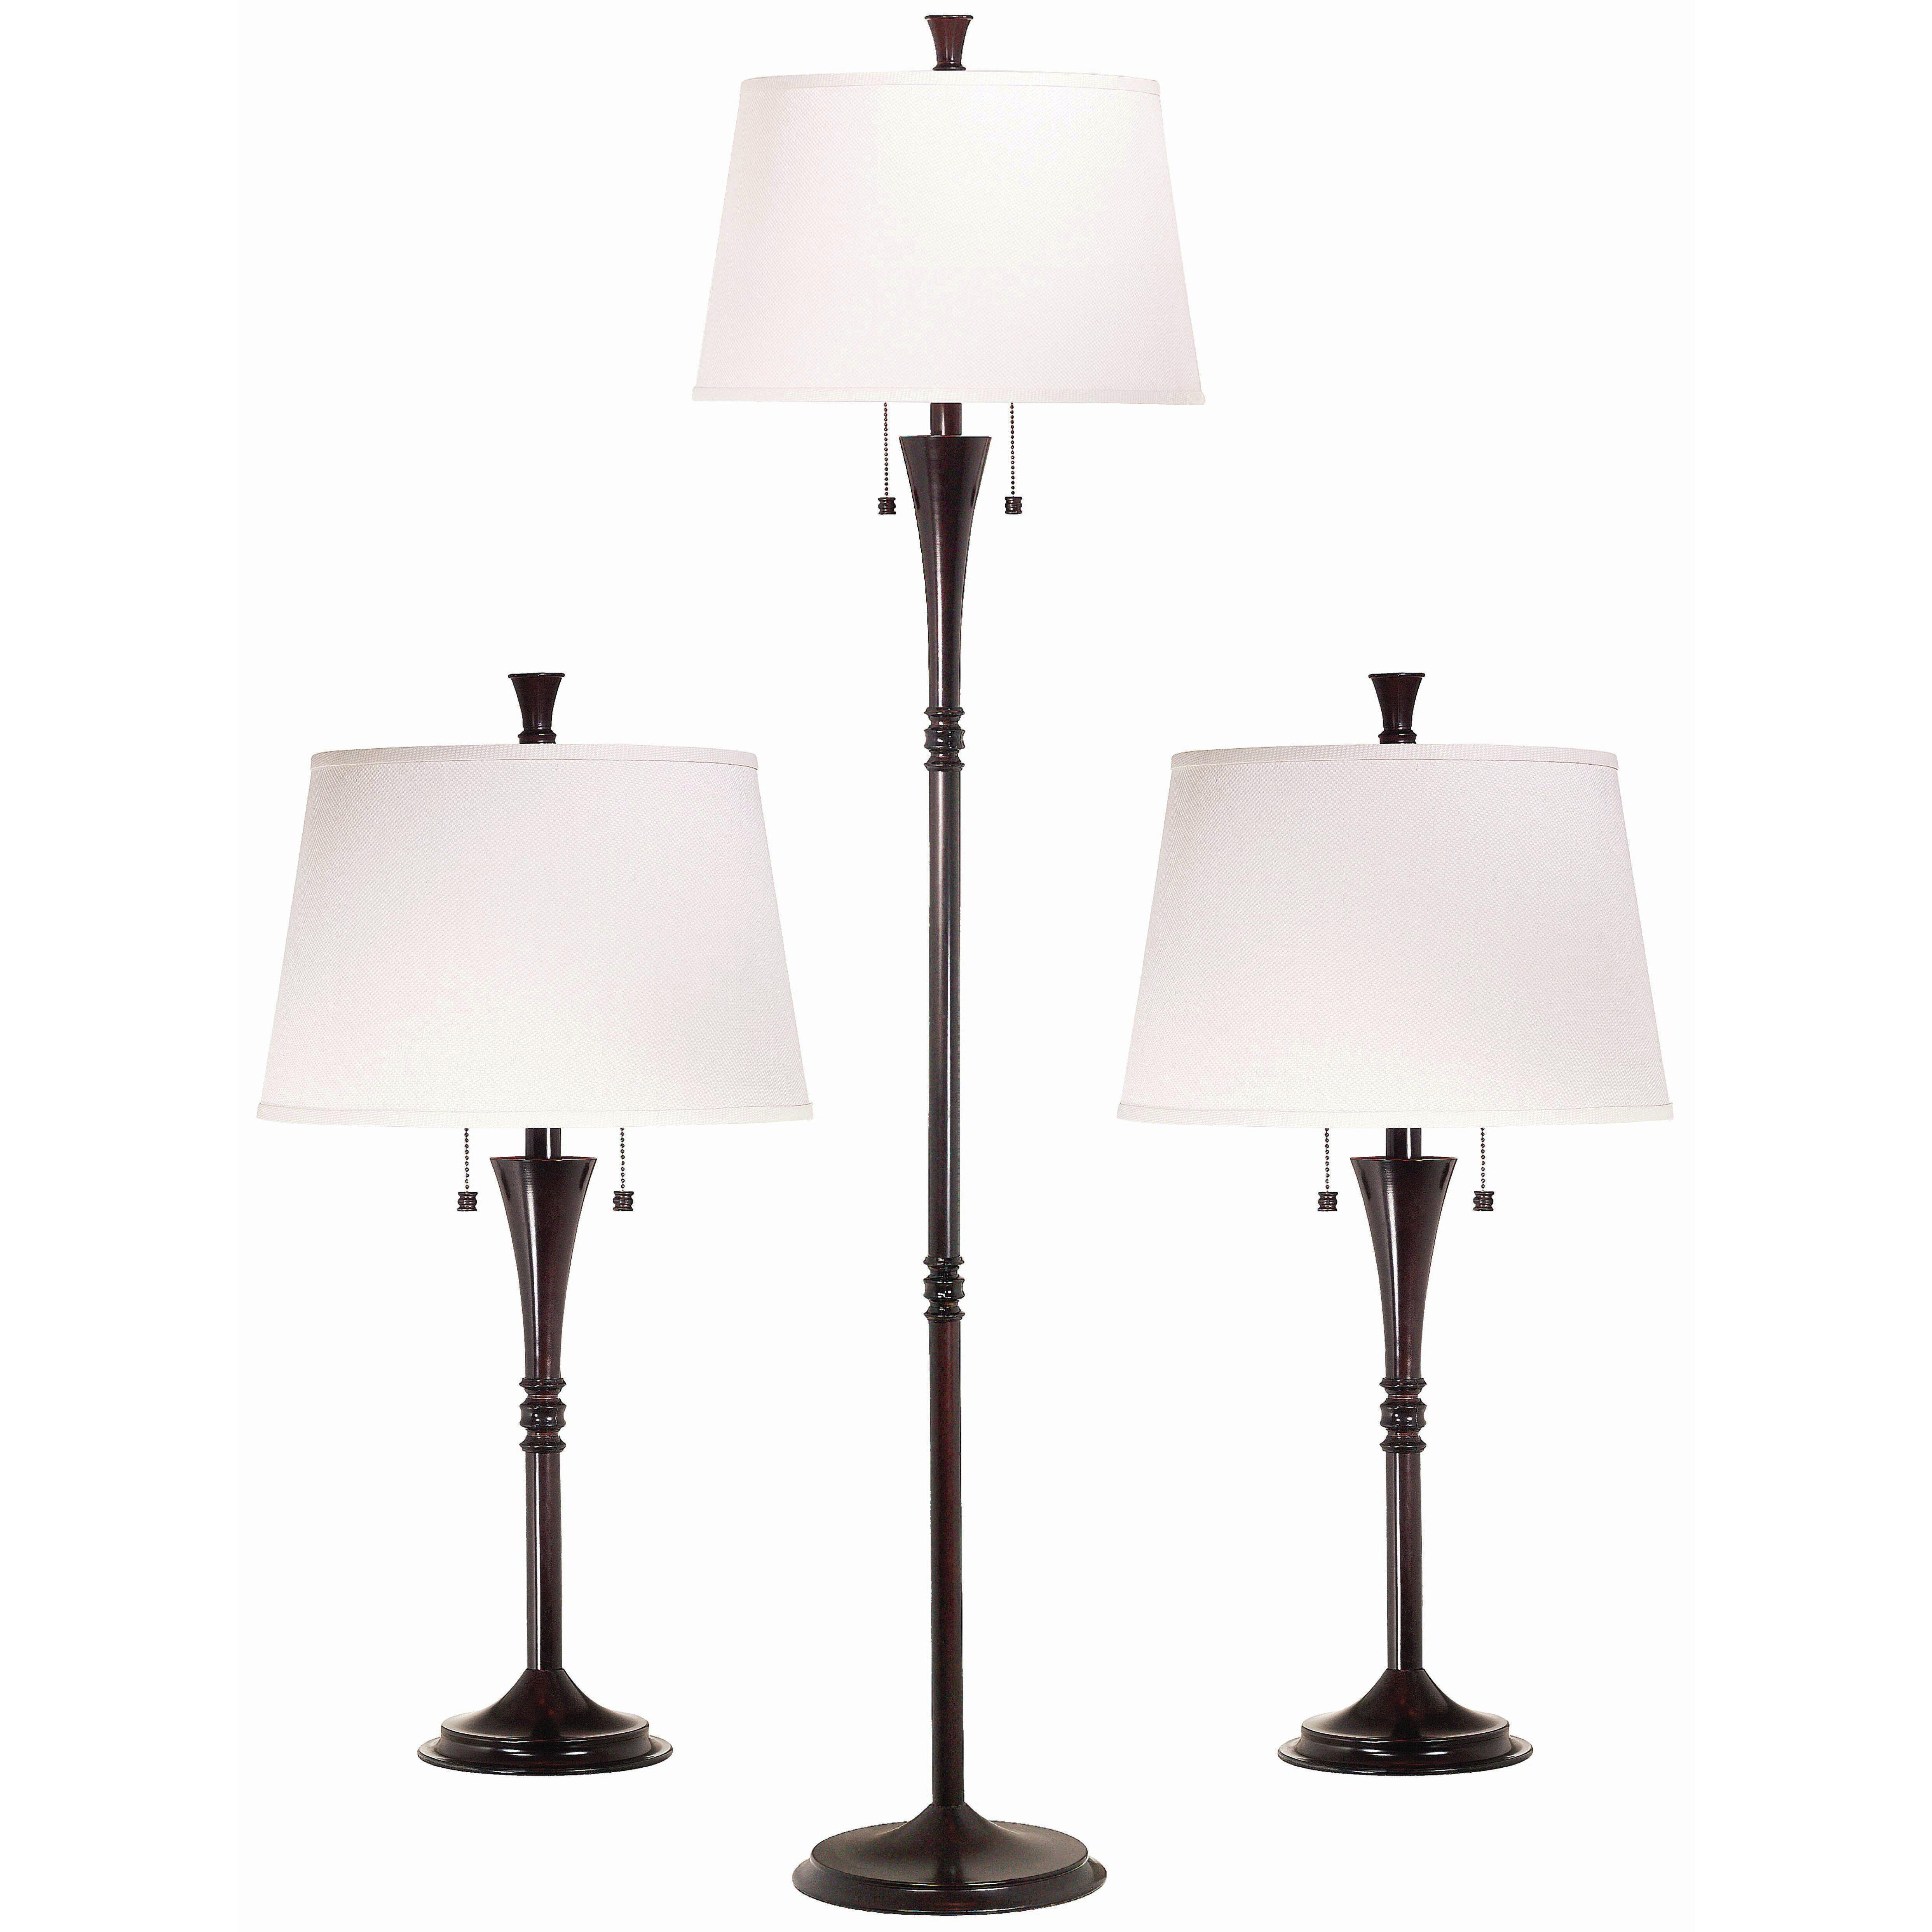 Wildon Home ® Rowena 3 Piece Table and Floor Lamp Set & Reviews ...:Wildon Home ® Rowena 3 Piece Table and Floor Lamp Set,Lighting